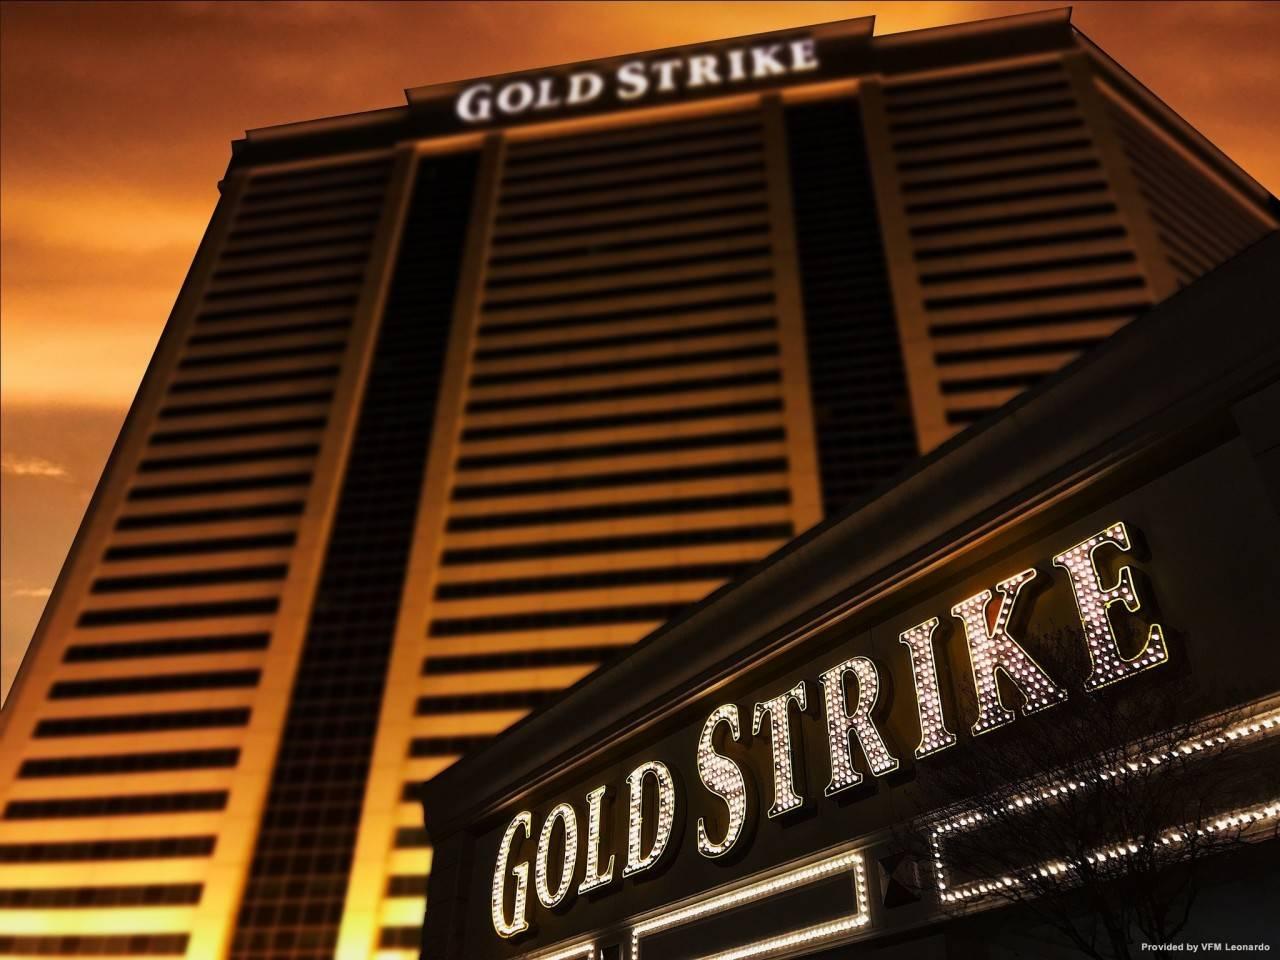 Gold stike casino paper mario 2 player games